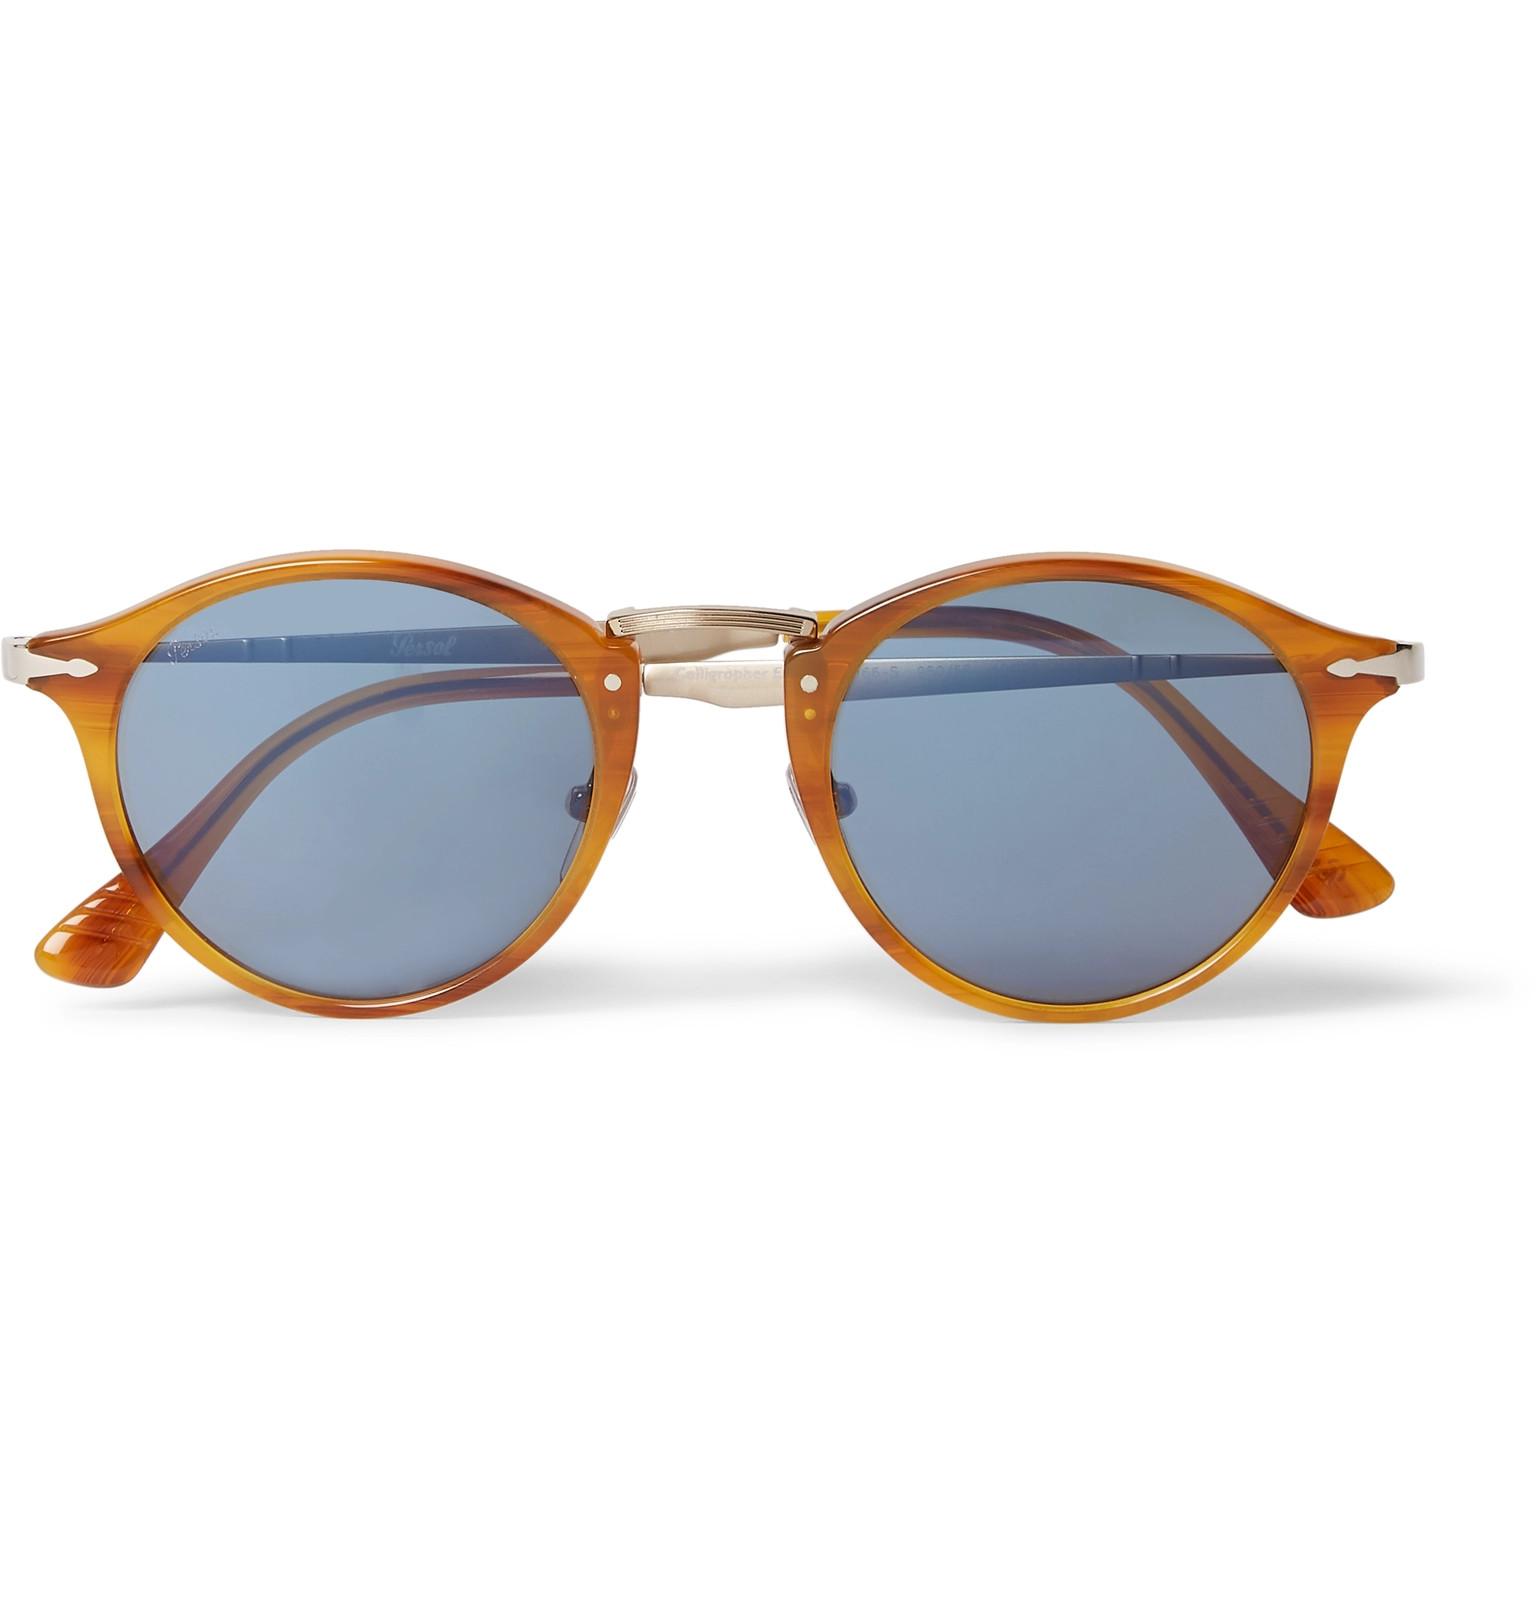 963fdafbfeaa Persol - Round-Frame Tortoiseshell Acetate and Gold-Tone Sunglasses